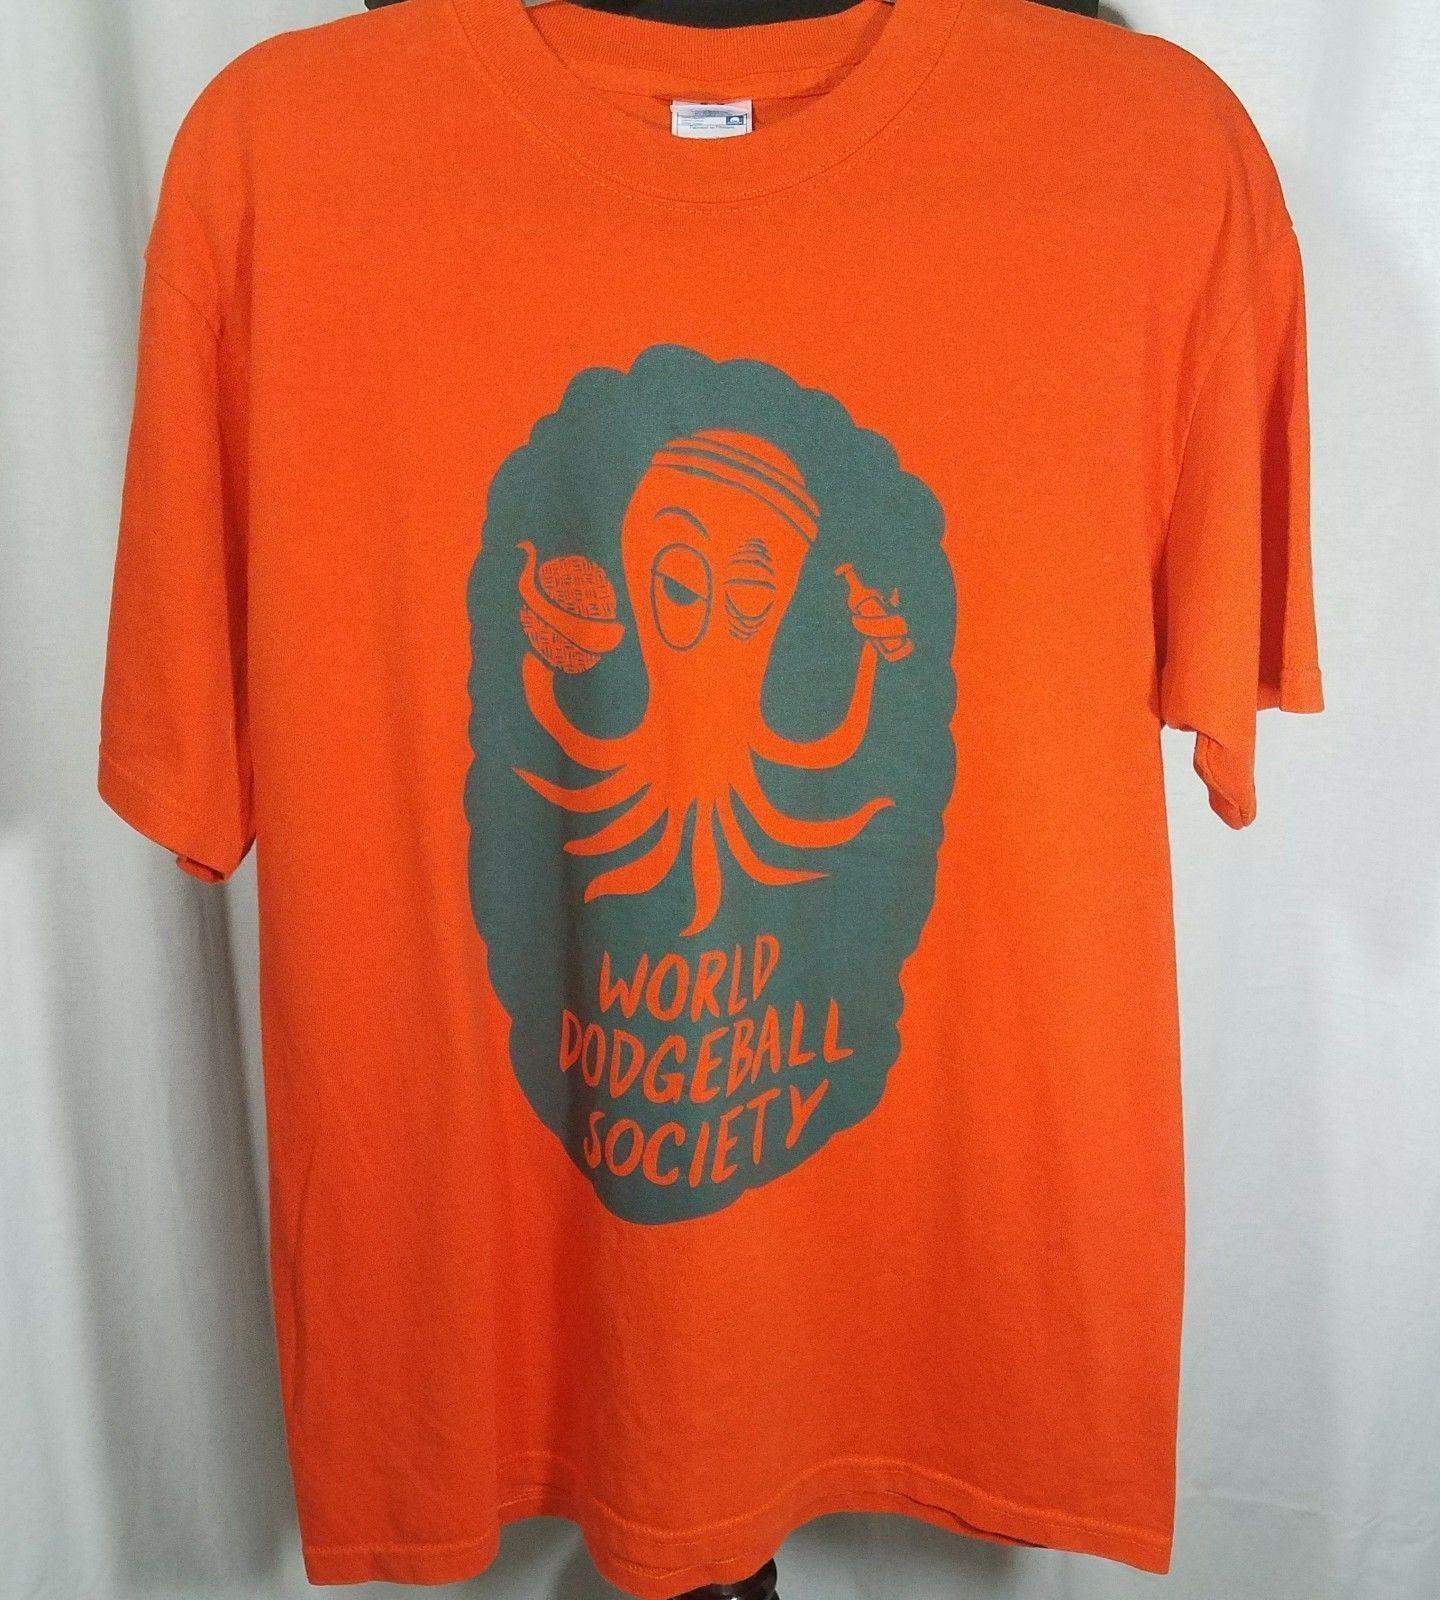 World Dodgeball Society T Shirt Orange Gray Octopus Ball Mens Size L